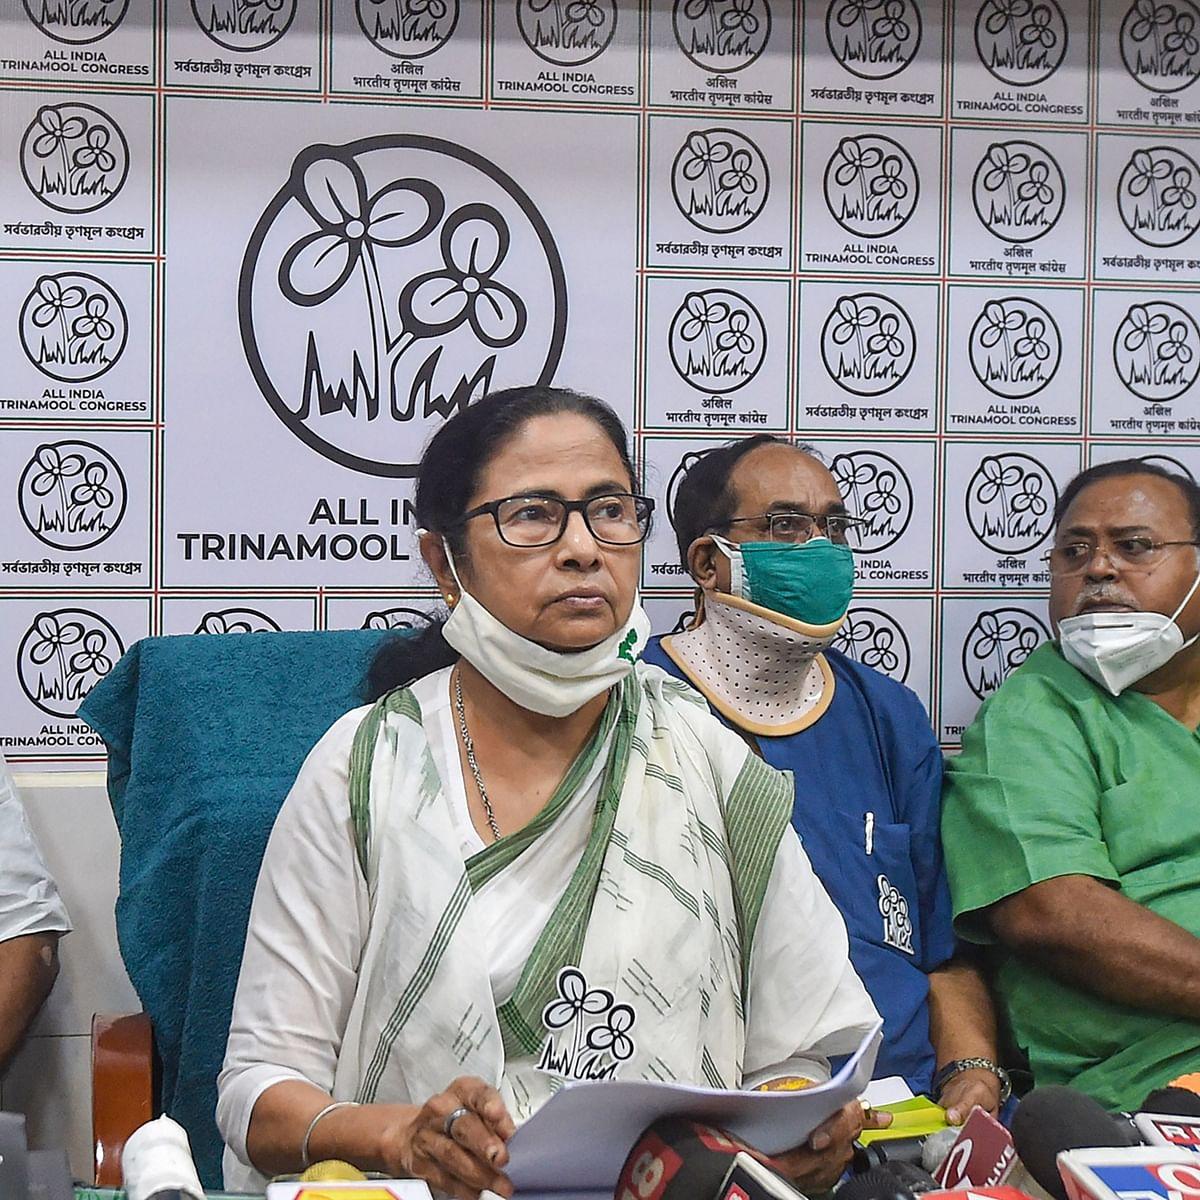 West Bengal Assembly polls 2021: Several sitting TMC MLAs cry foul despite Mamata Banerjee's assurance to form 'Vidhan Parishad'